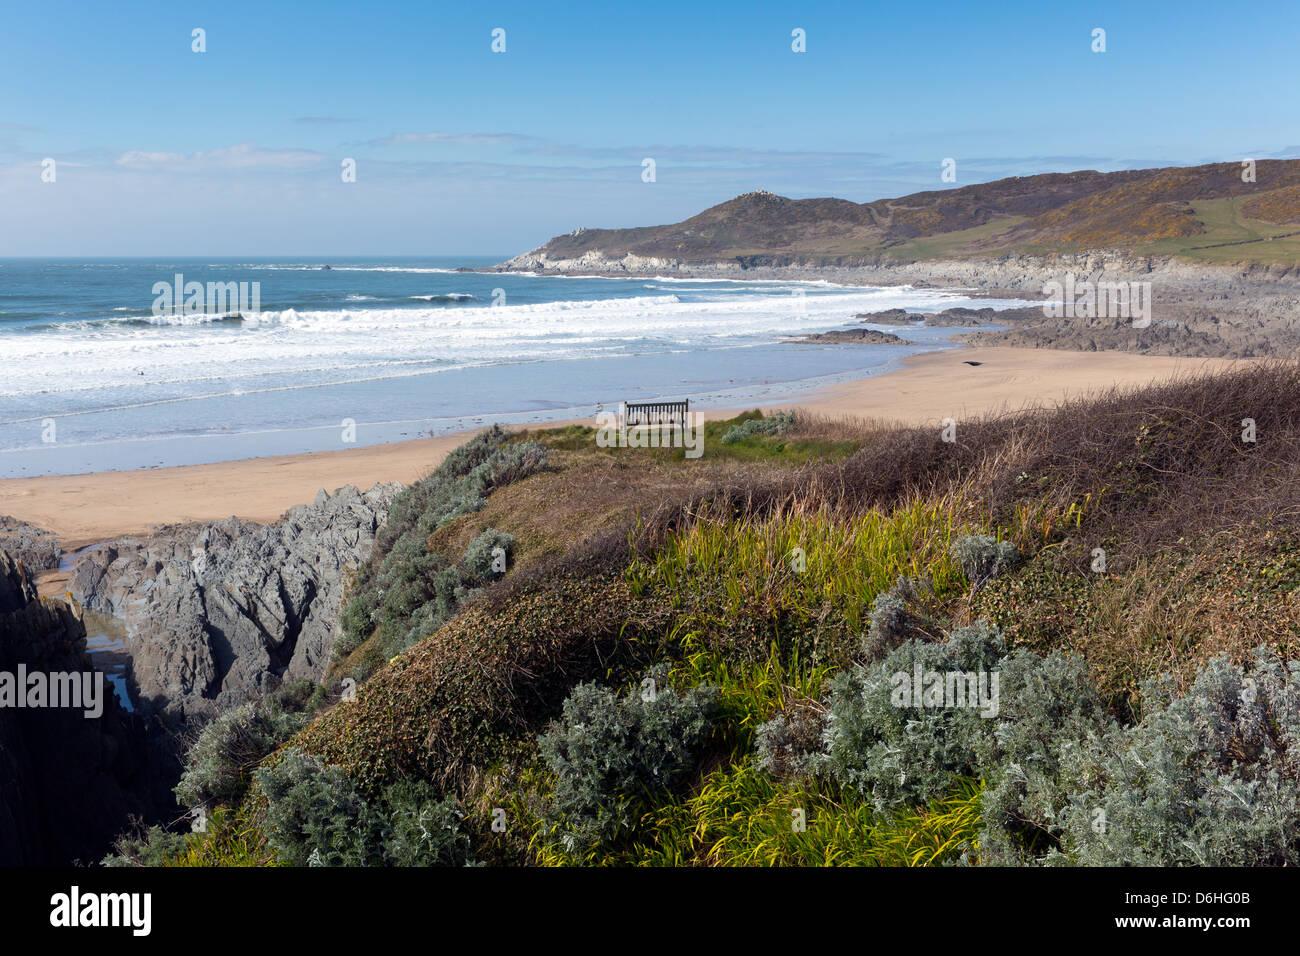 Woolacombe Devon England coastline towards Morte Point from South West Coast Path viewStock Photo